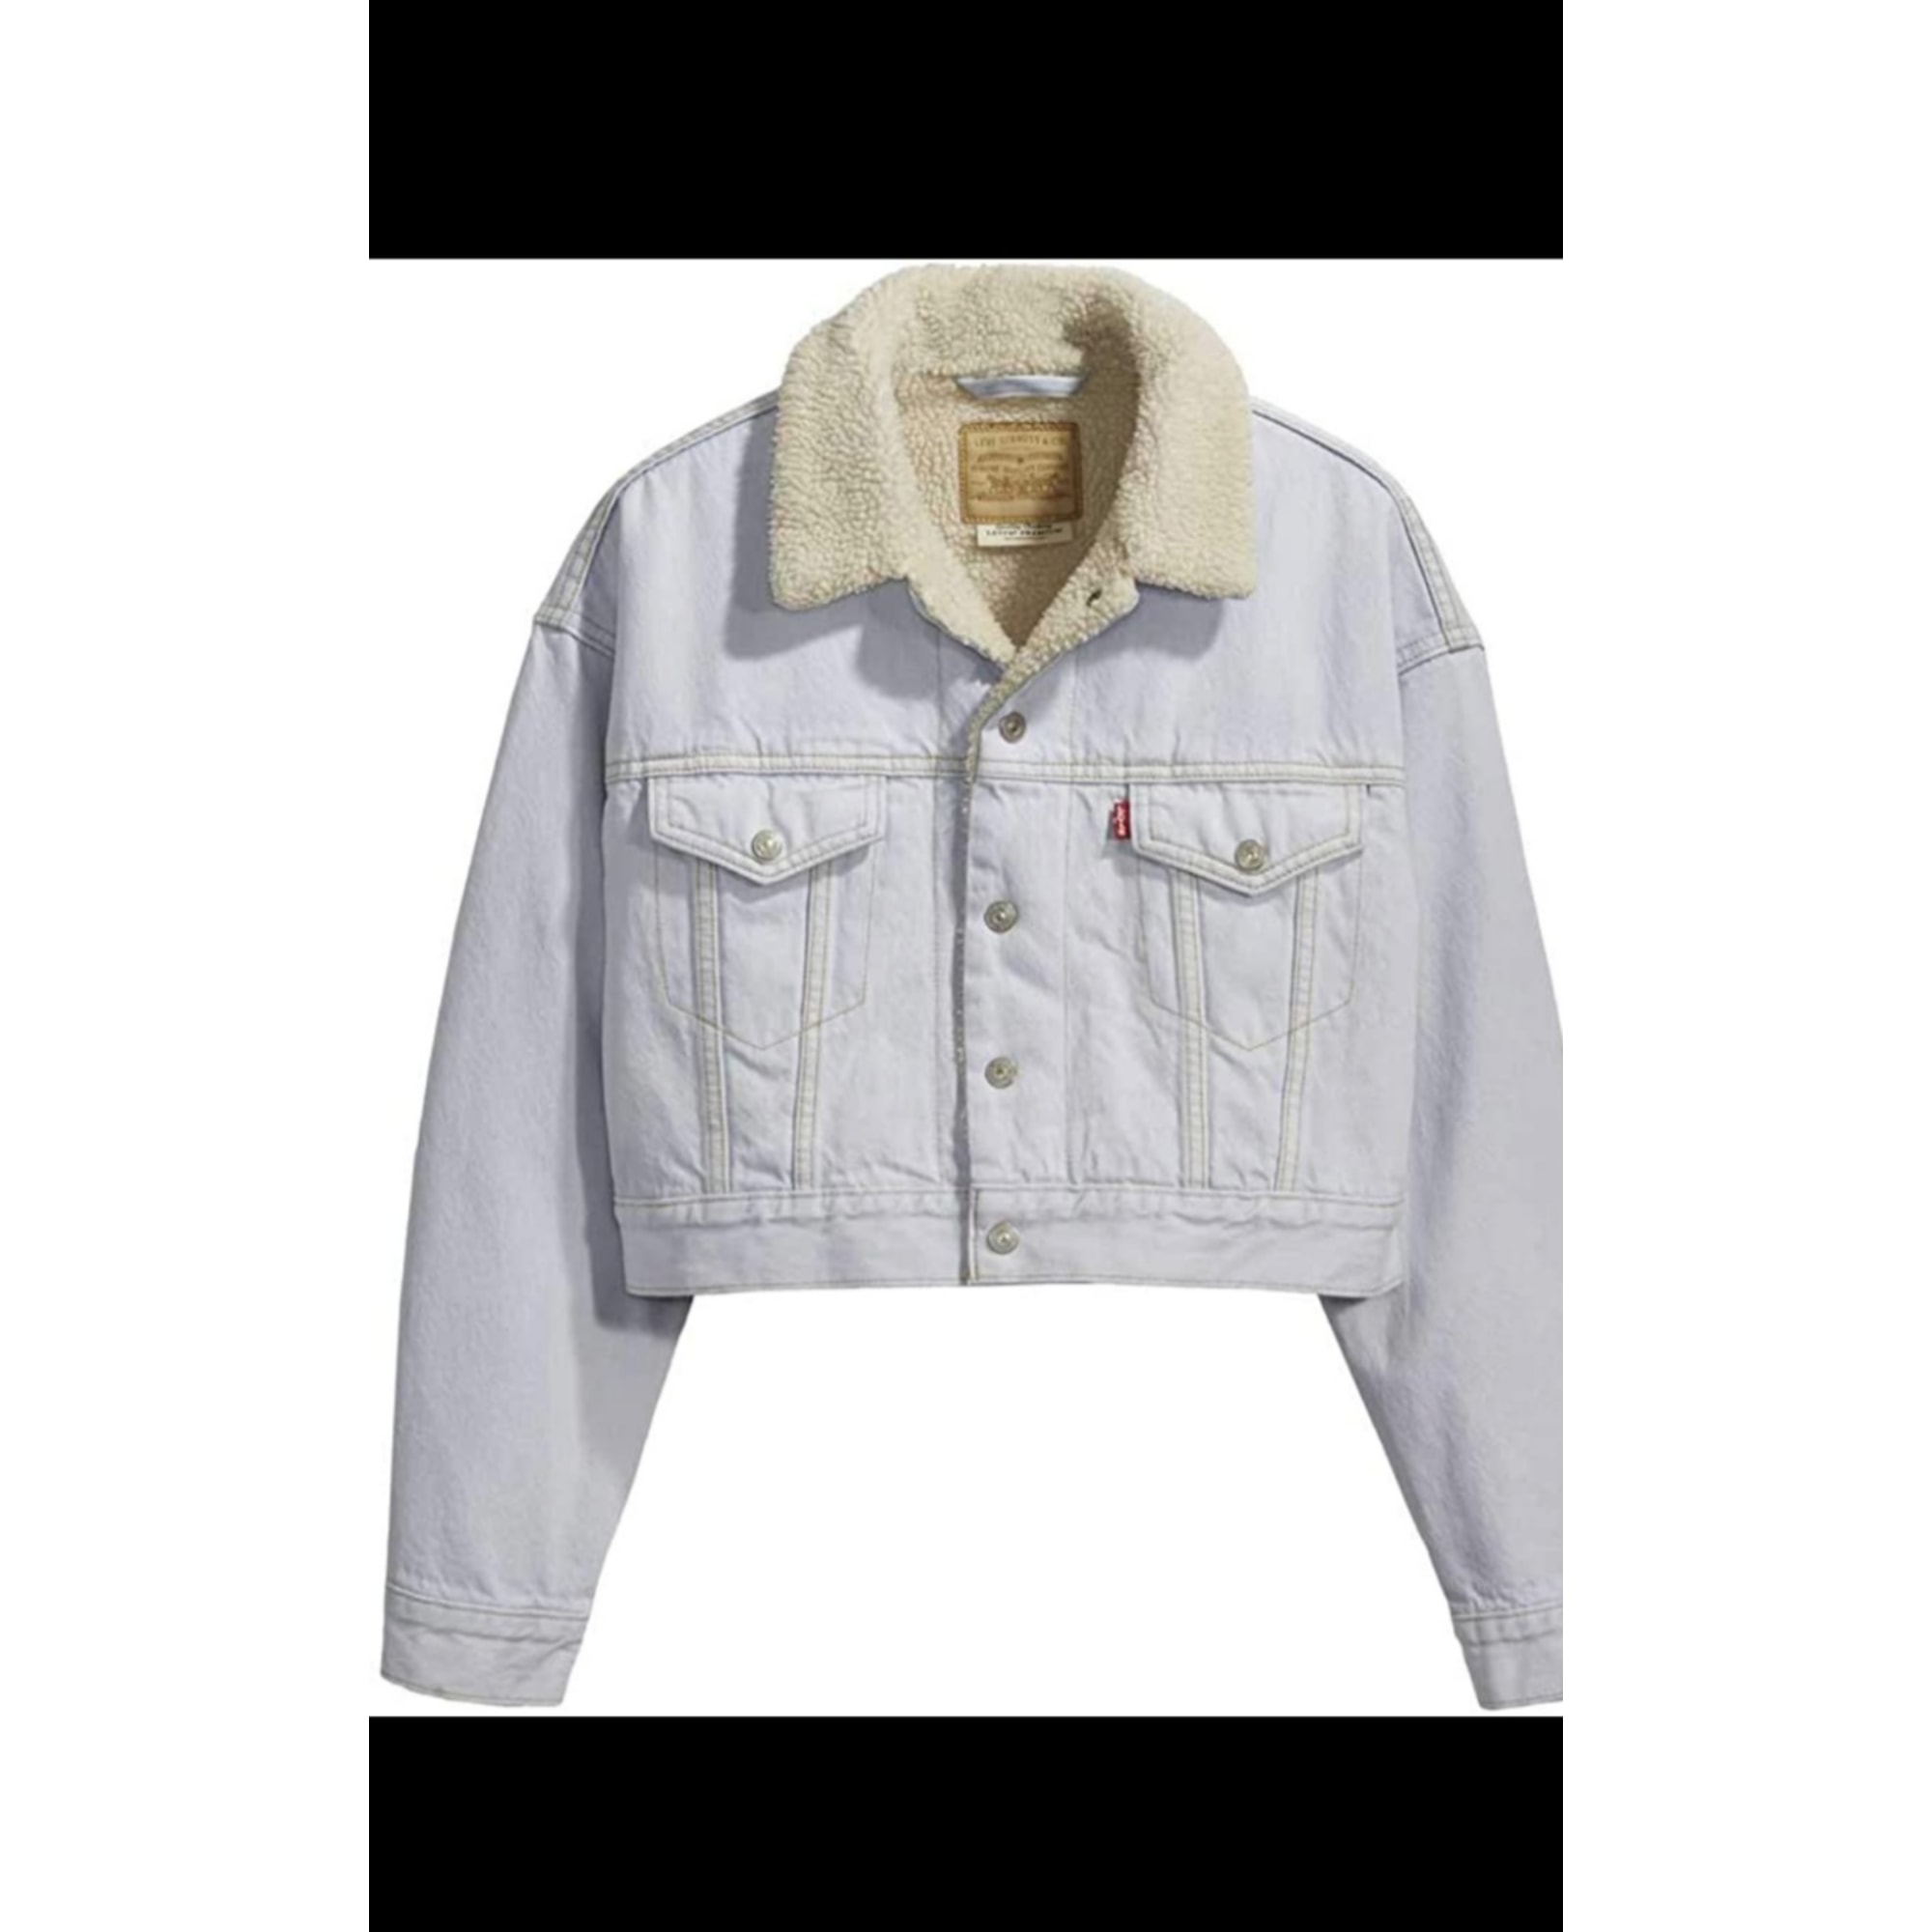 Blouson en jean LEVI'S Blanc, blanc cassé, écru